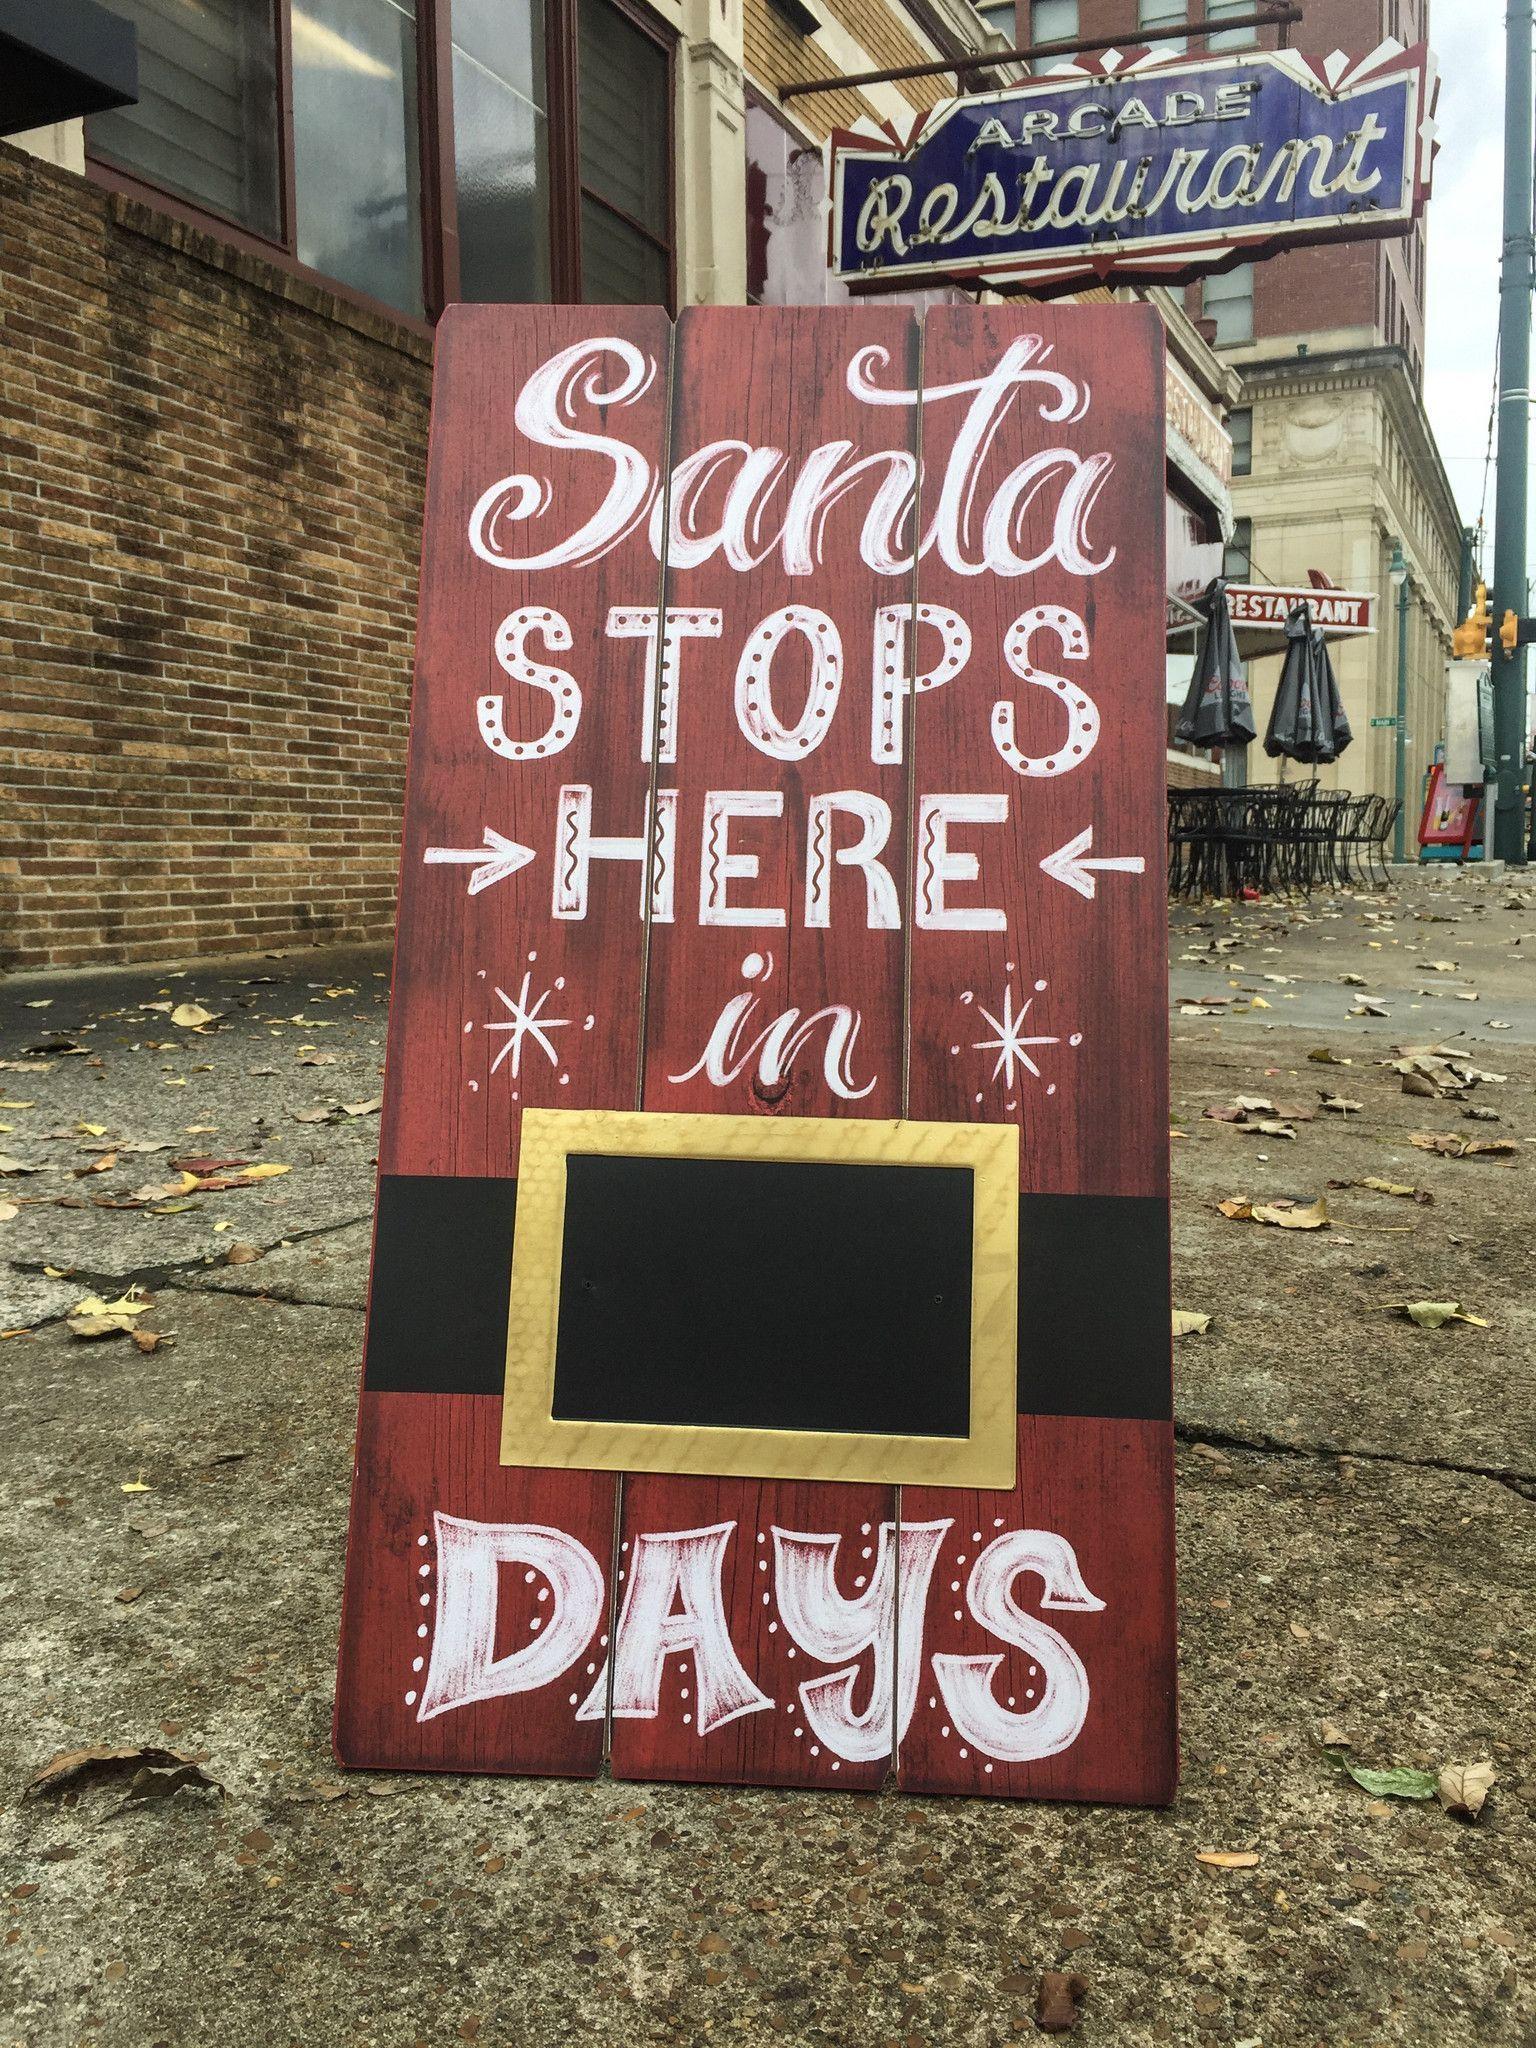 Best 25 Christmas Pallet Signs Ideas On Pinterest Christmas With Christmas Pallet Signs Wooden Christmas Crafts Christmas Wood Pallet Christmas